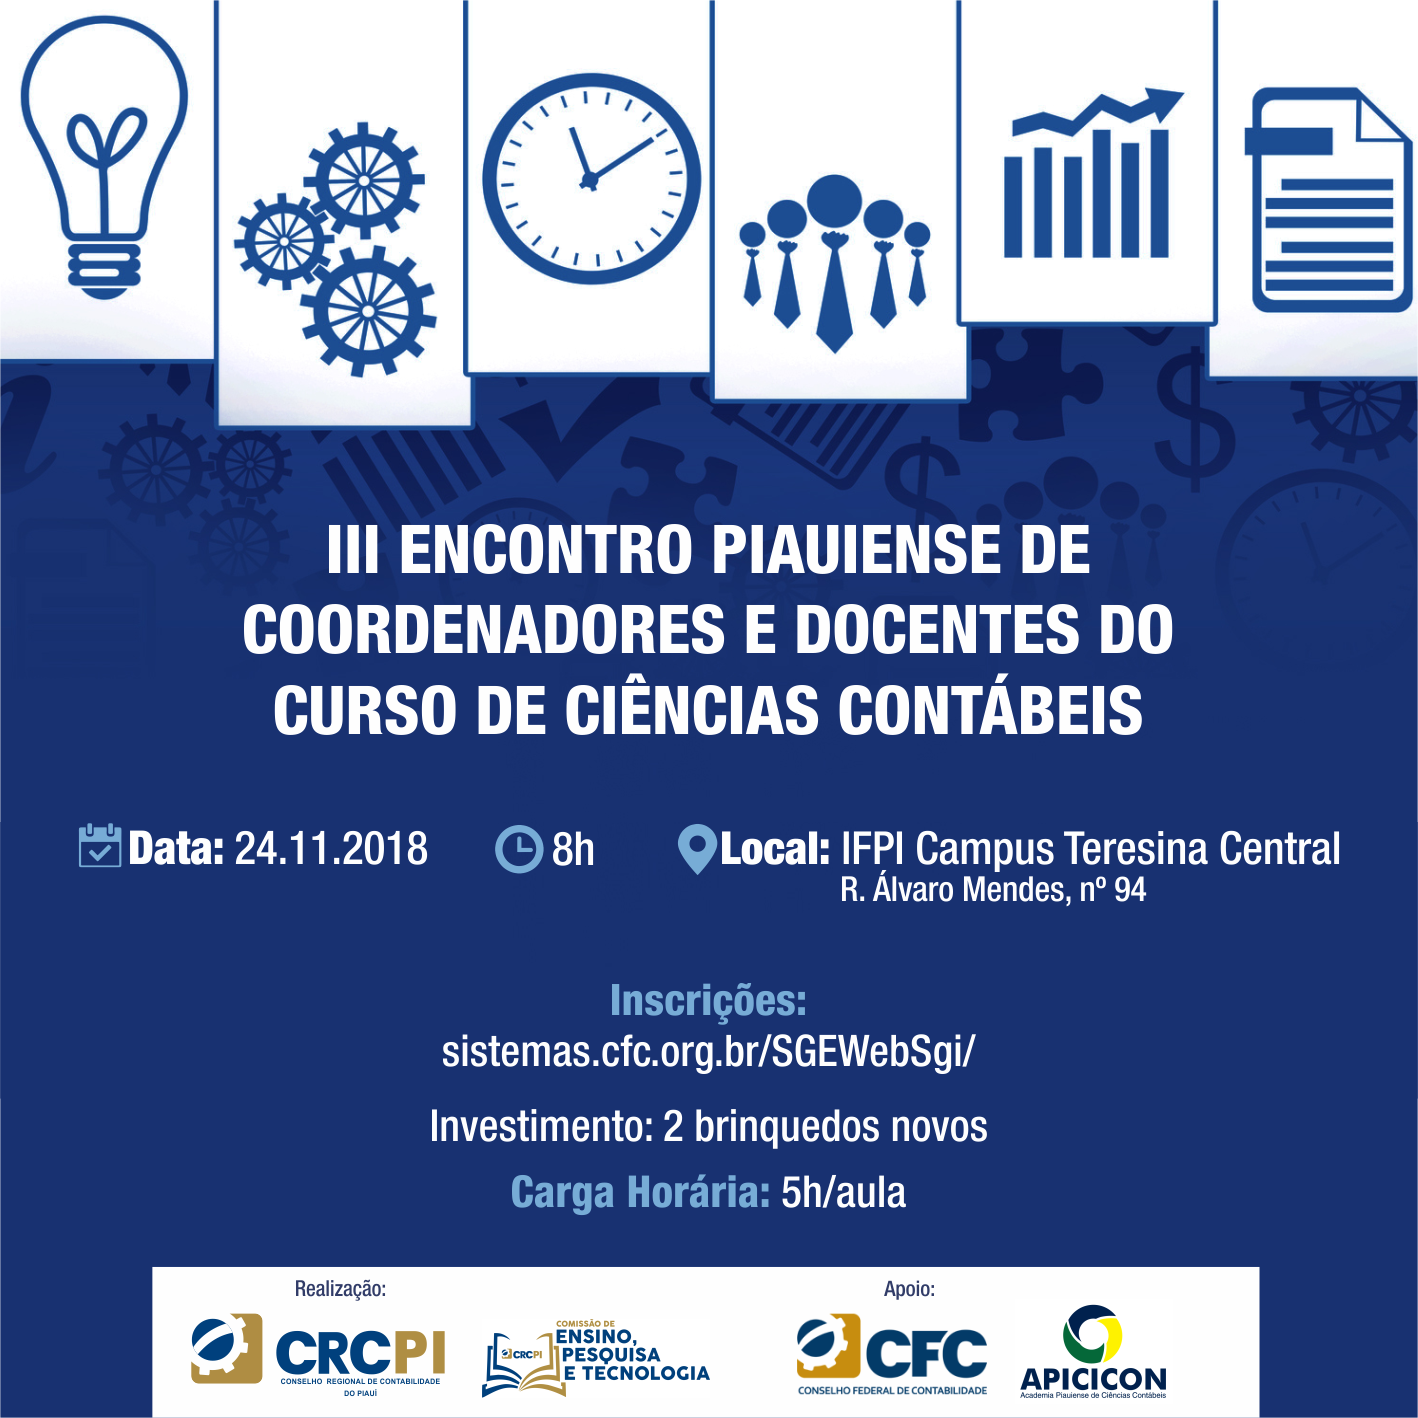 CRC-PI promove o III Encontro Piauiense de Coordenadores e Docentes do Curso de Ciências Contábeis do Piauí